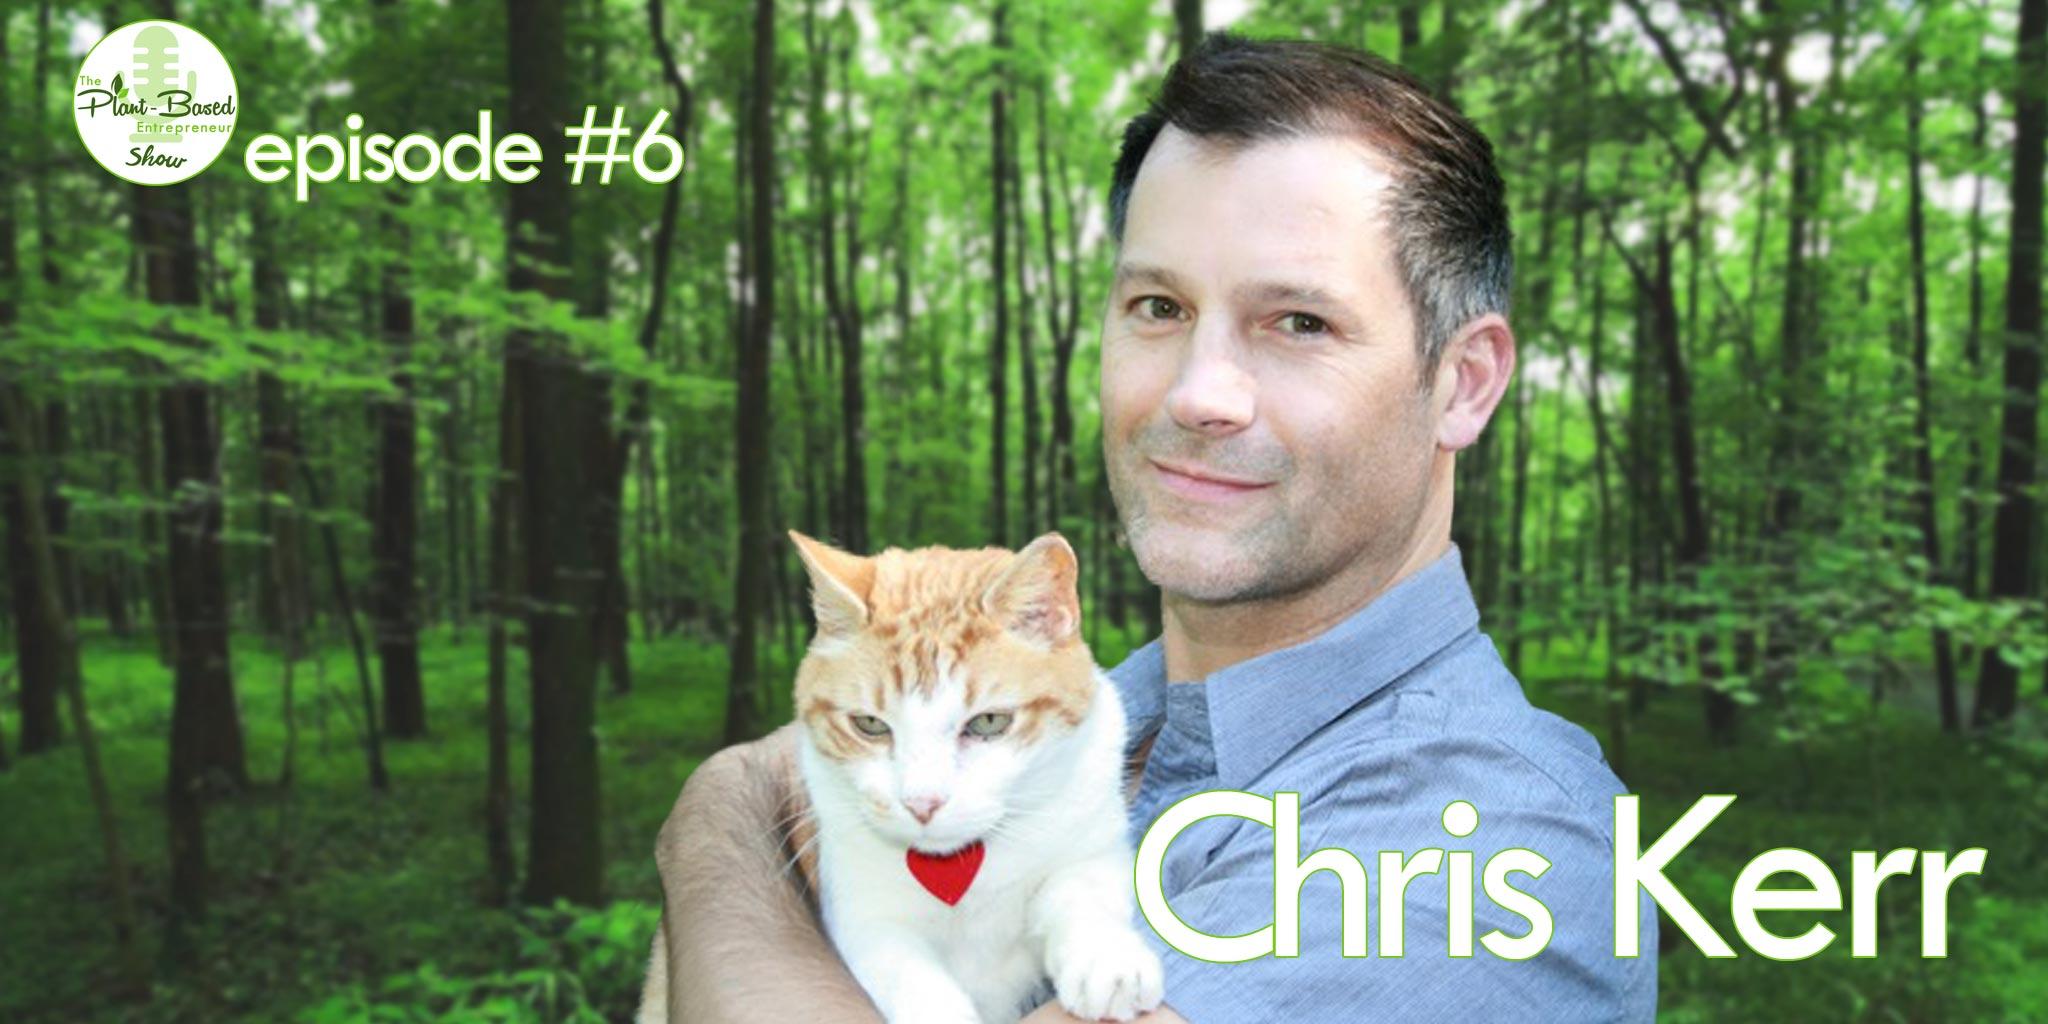 Episode #6 - Chris Kerr